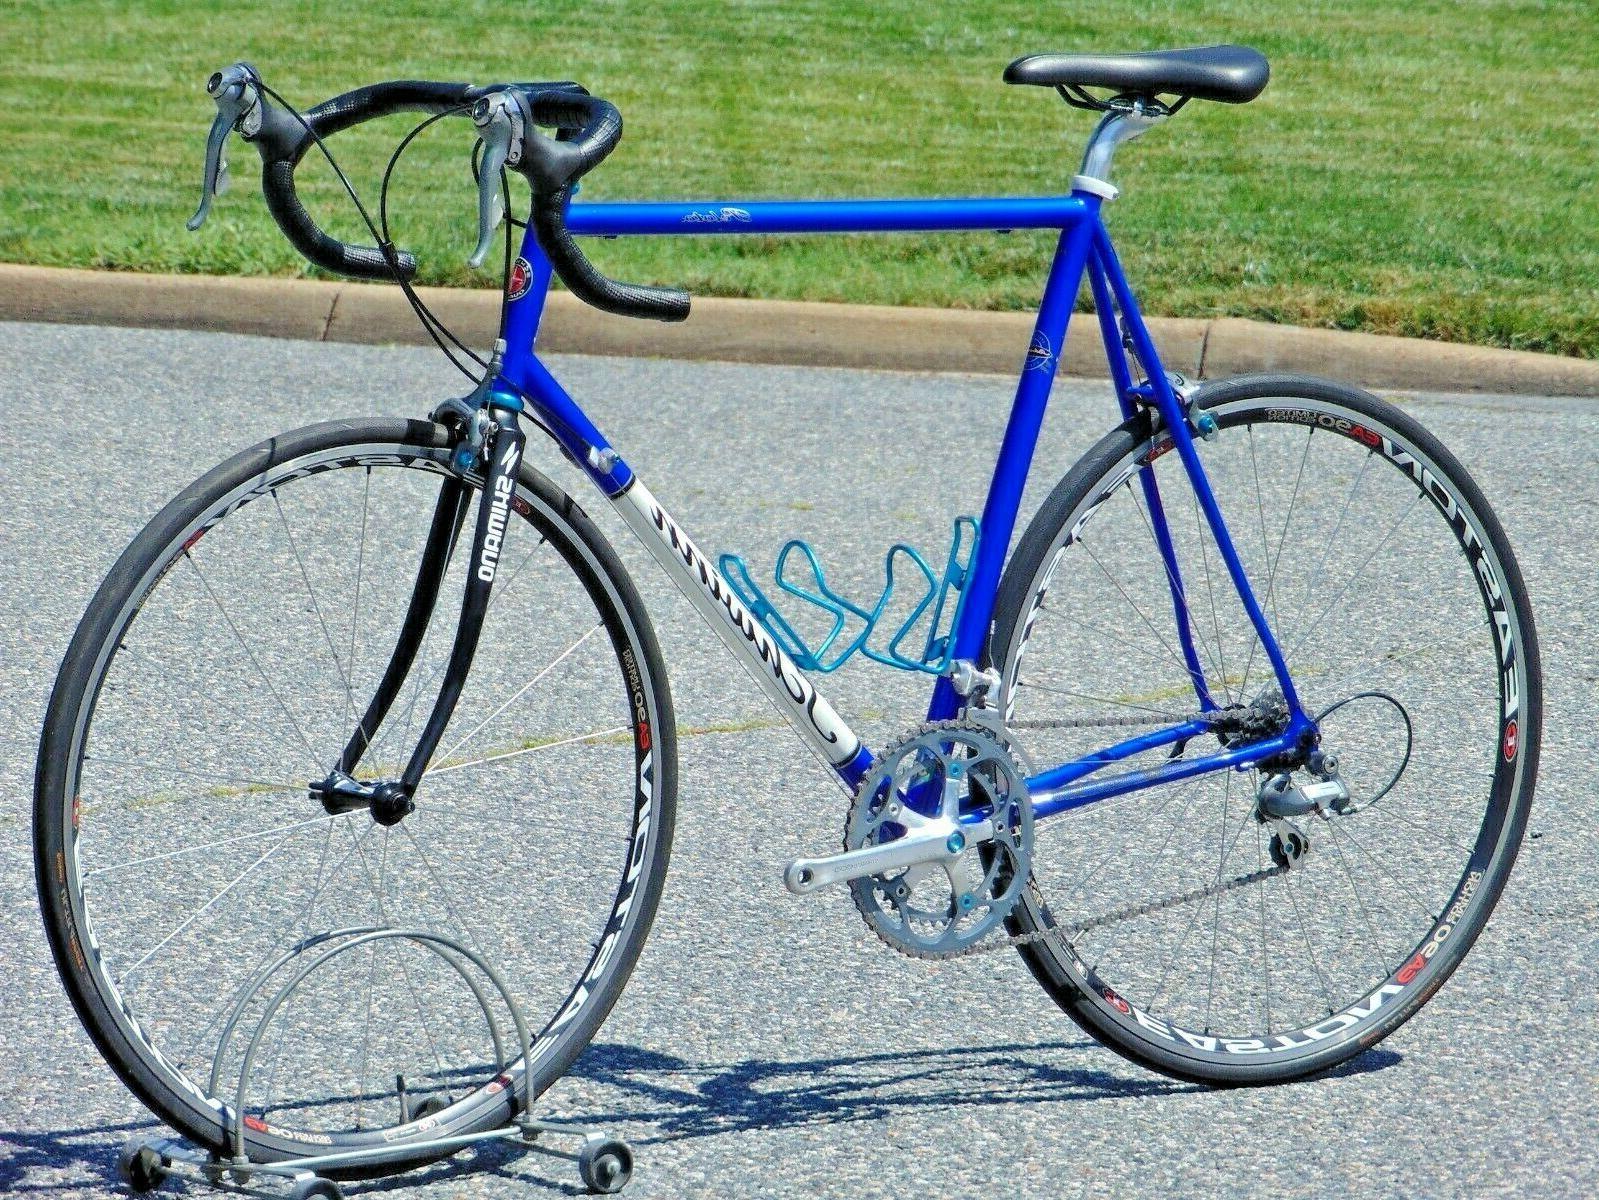 peloton super light road bike reynolds 853